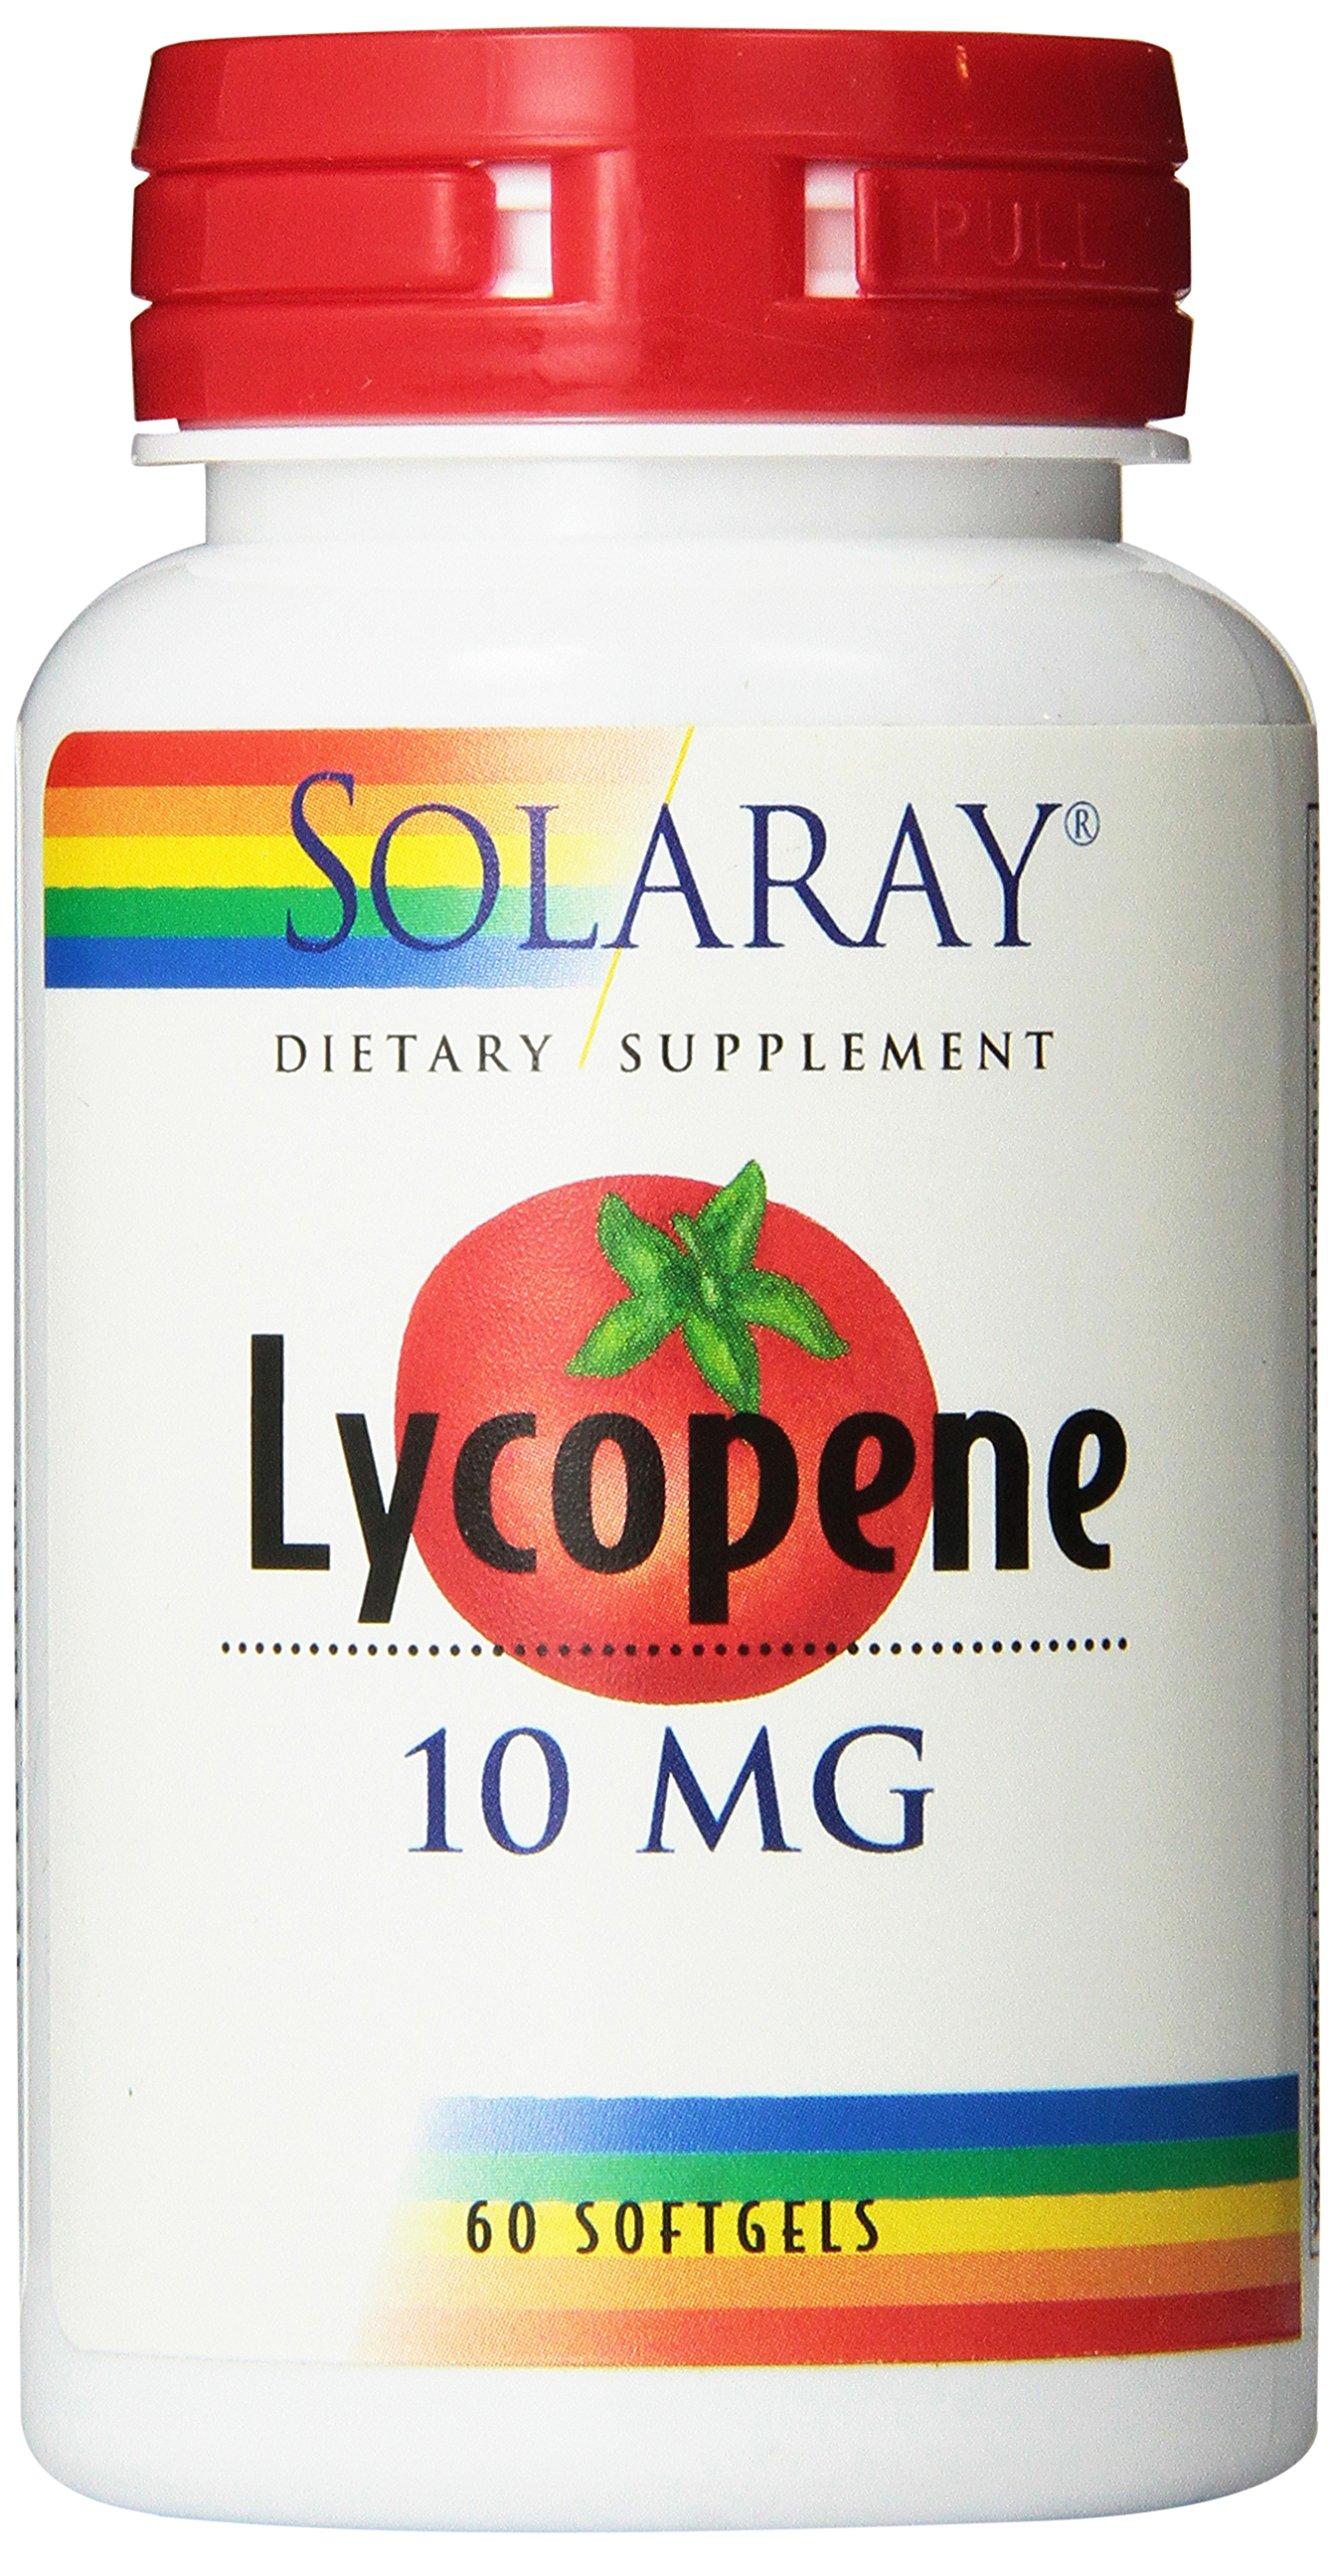 Solaray Lycopene Supplement, 10 mg, 60 Count